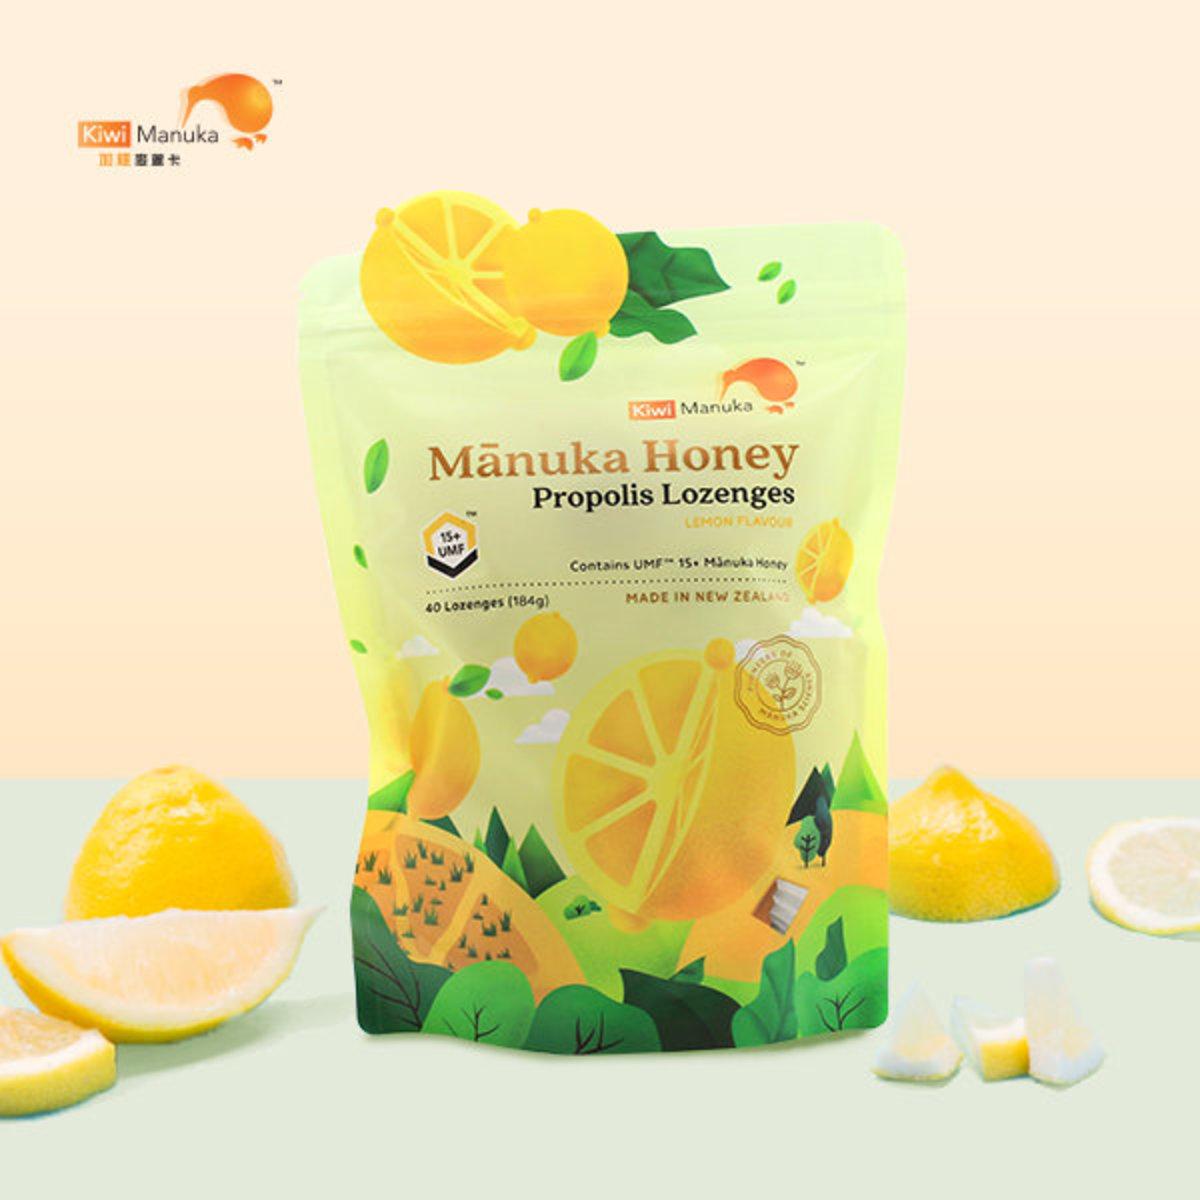 UMF 15+ / 514+ MG0 級麥蘆卡蜂蜜喉片檸檬味 (184g) <全新包裝>